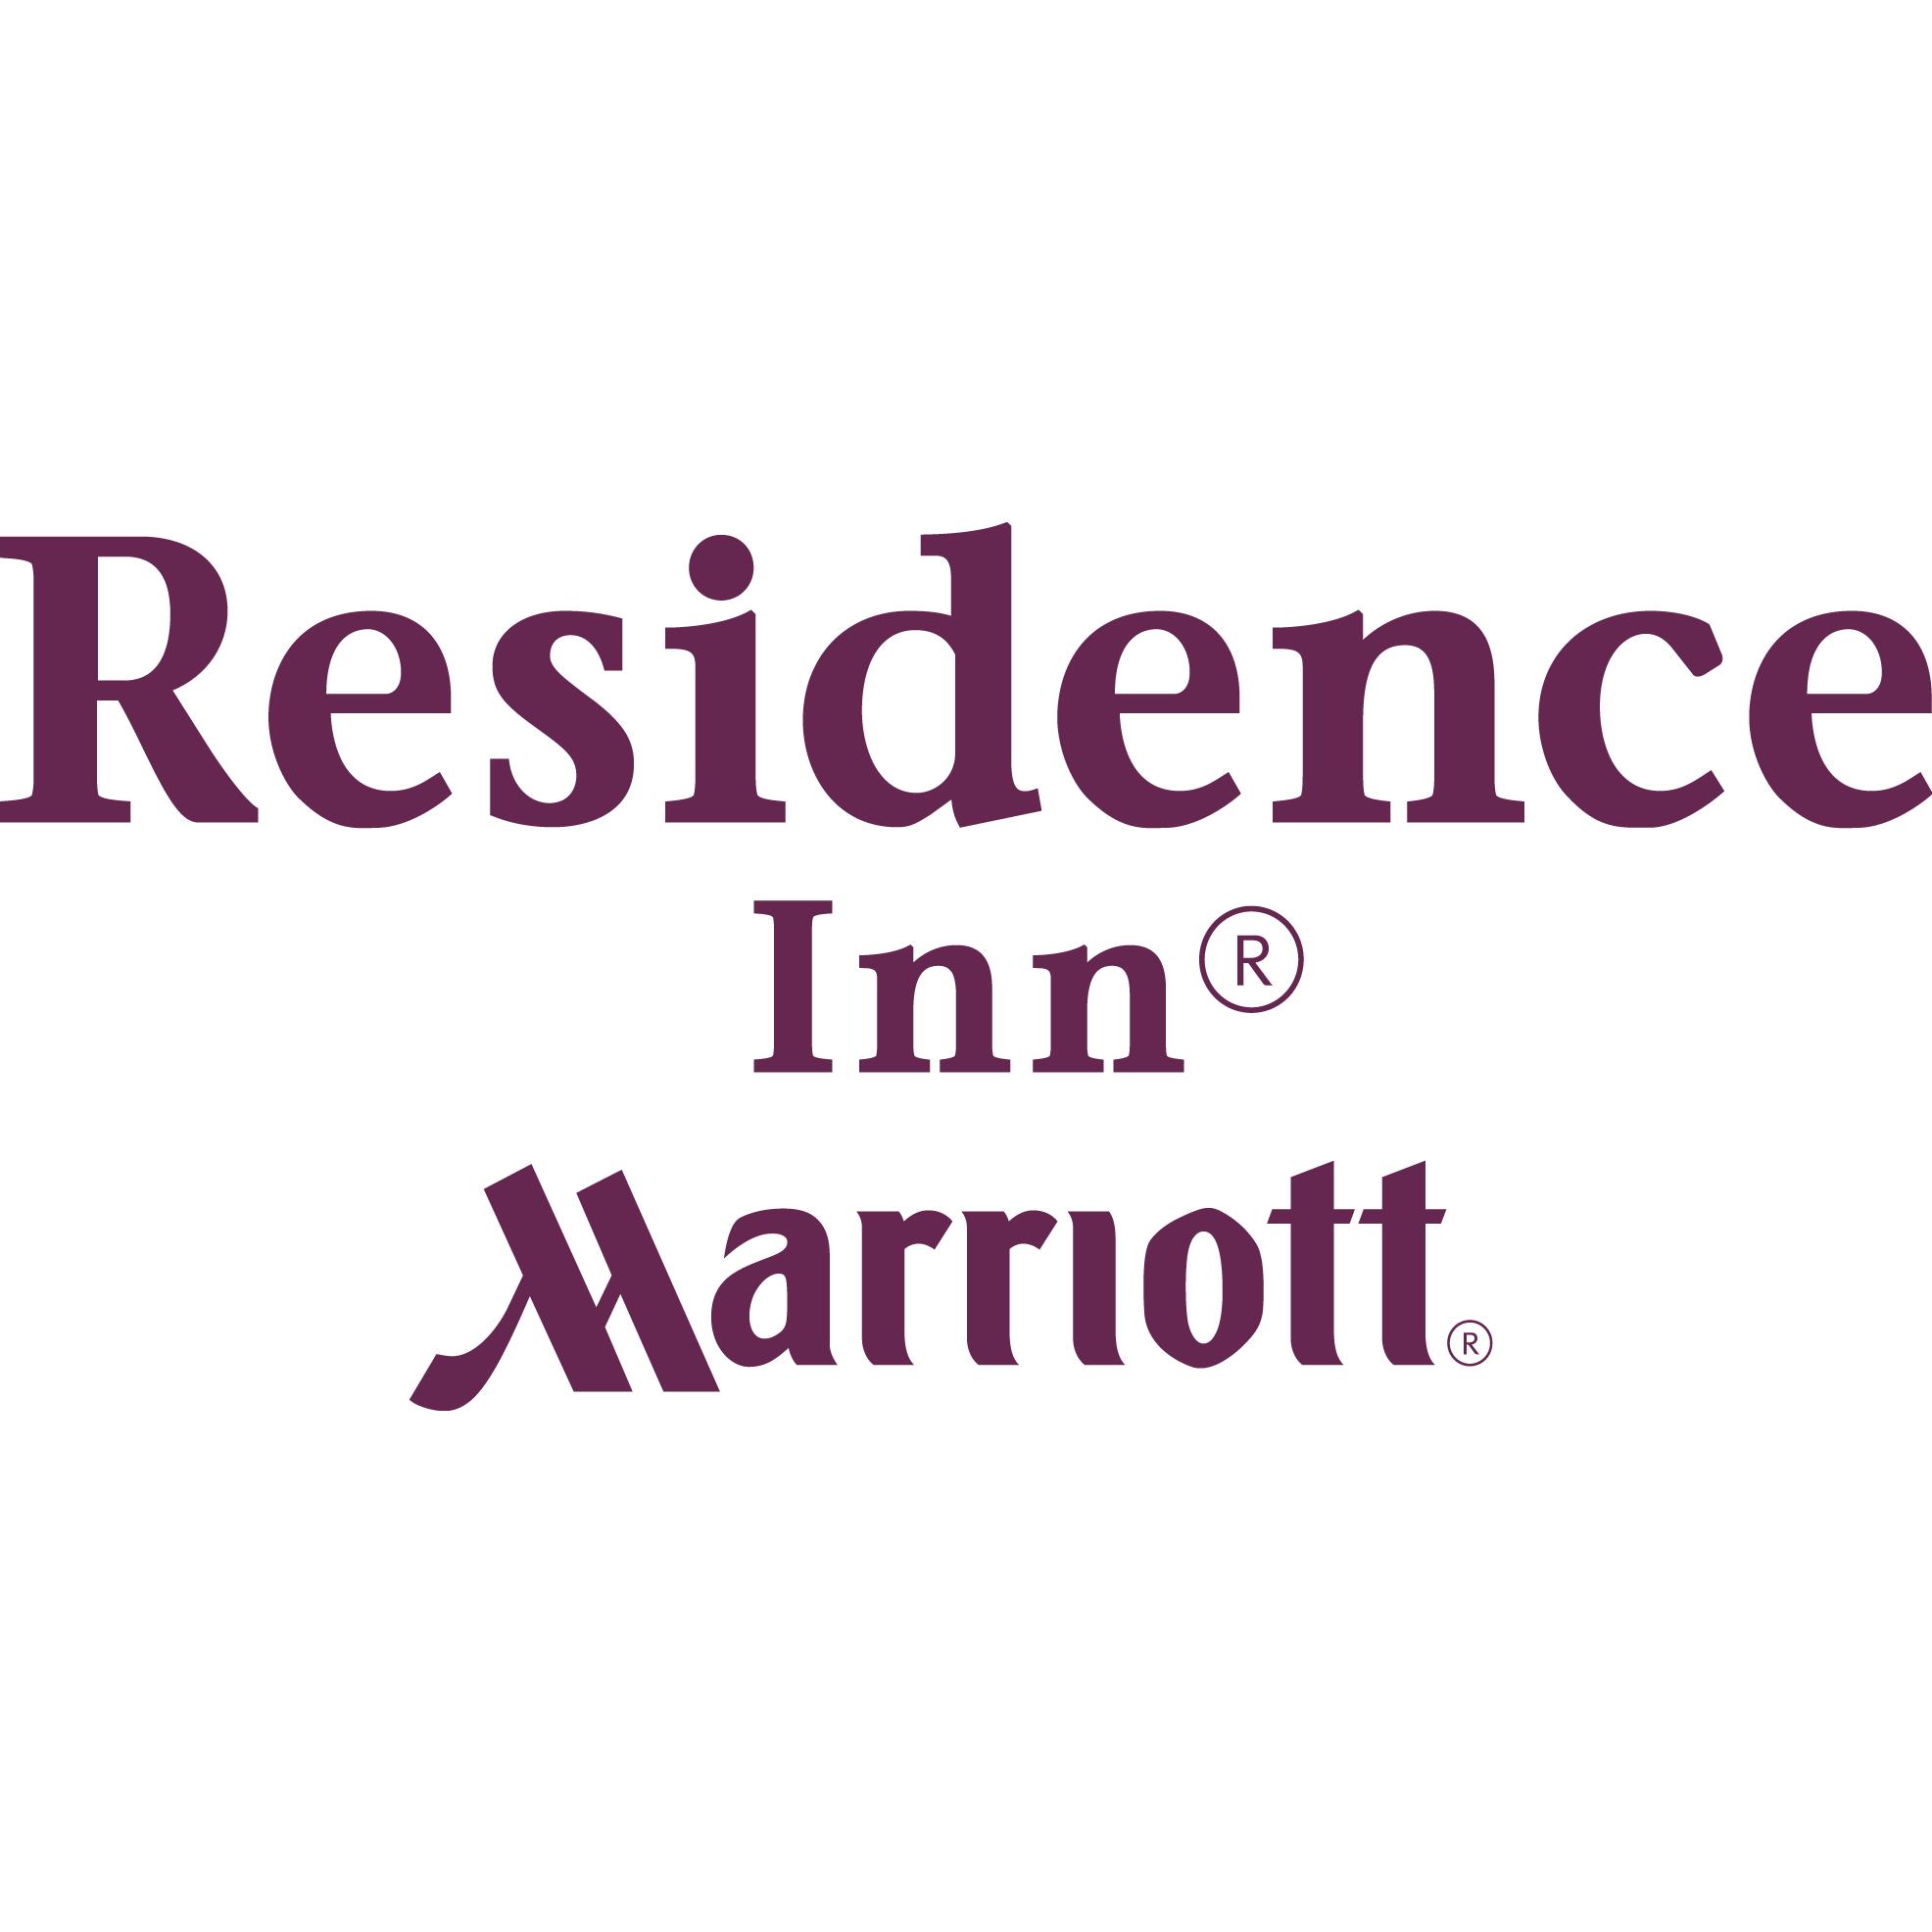 Residence Inn by Marriott Orlando Downtown - Orlando, FL - Hotels & Motels